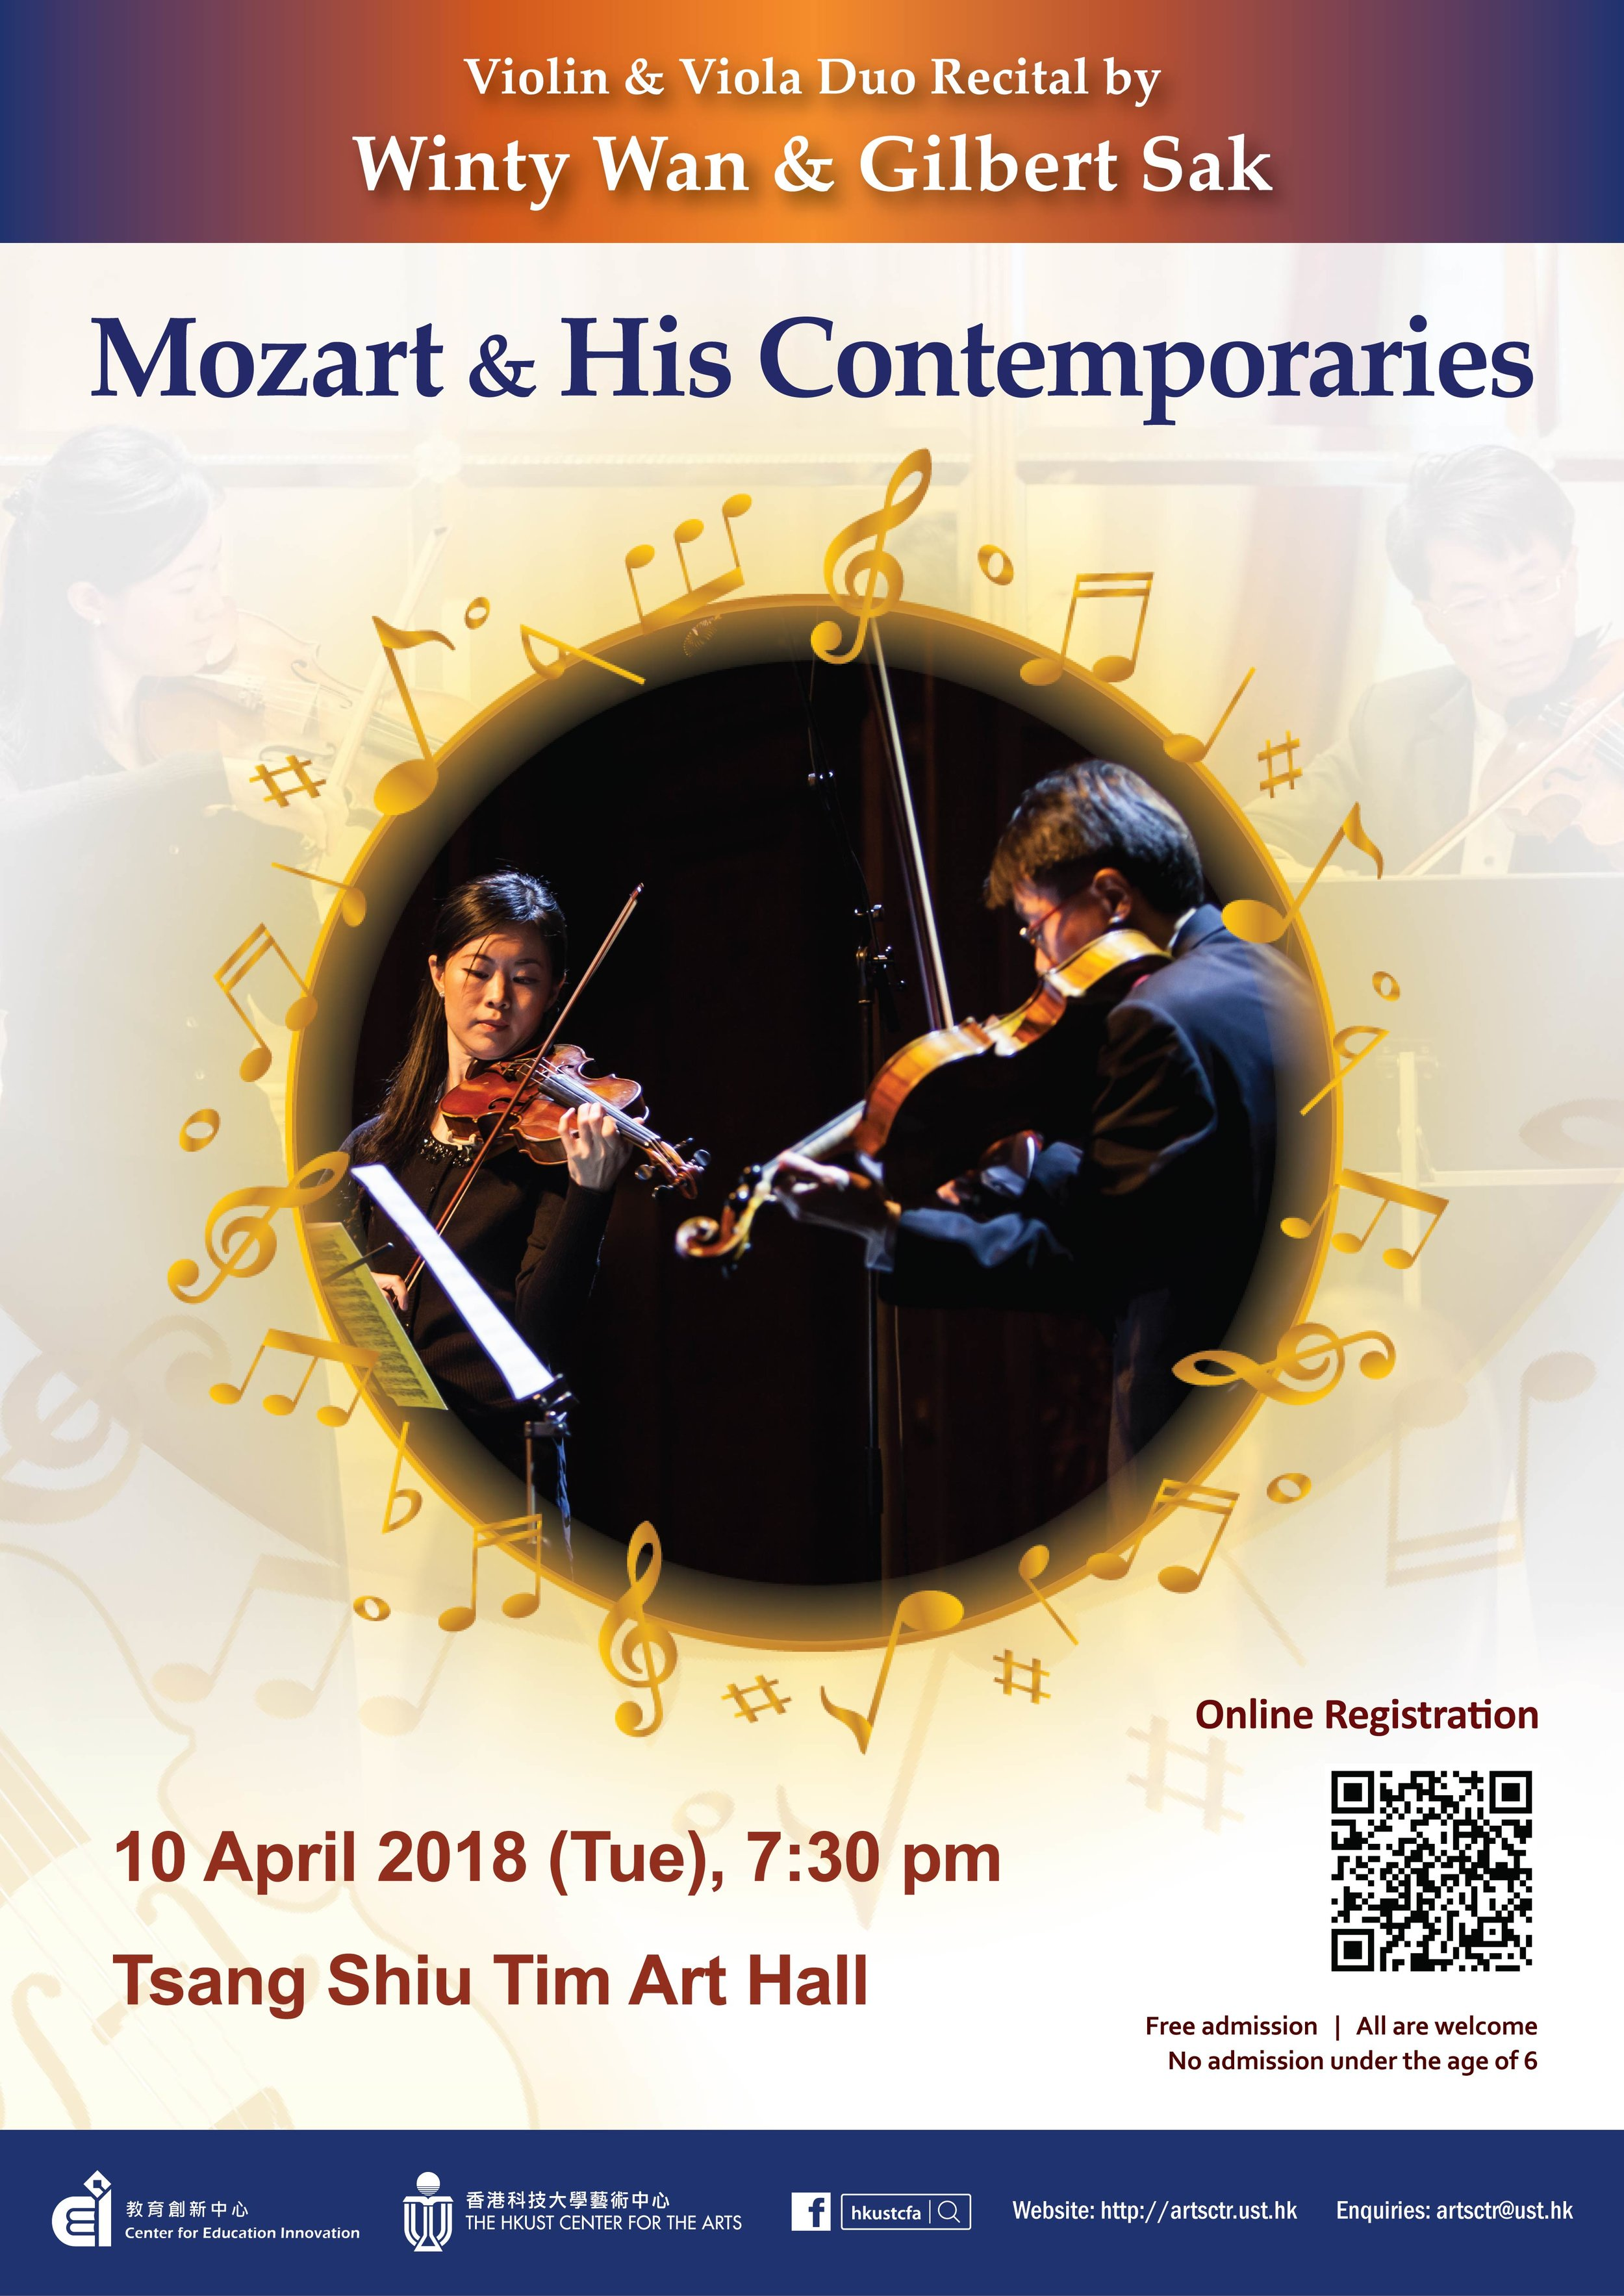 Violin and Viola Duo Recital by Winty Wan and Gilbert Sak  Apr 10, 2018